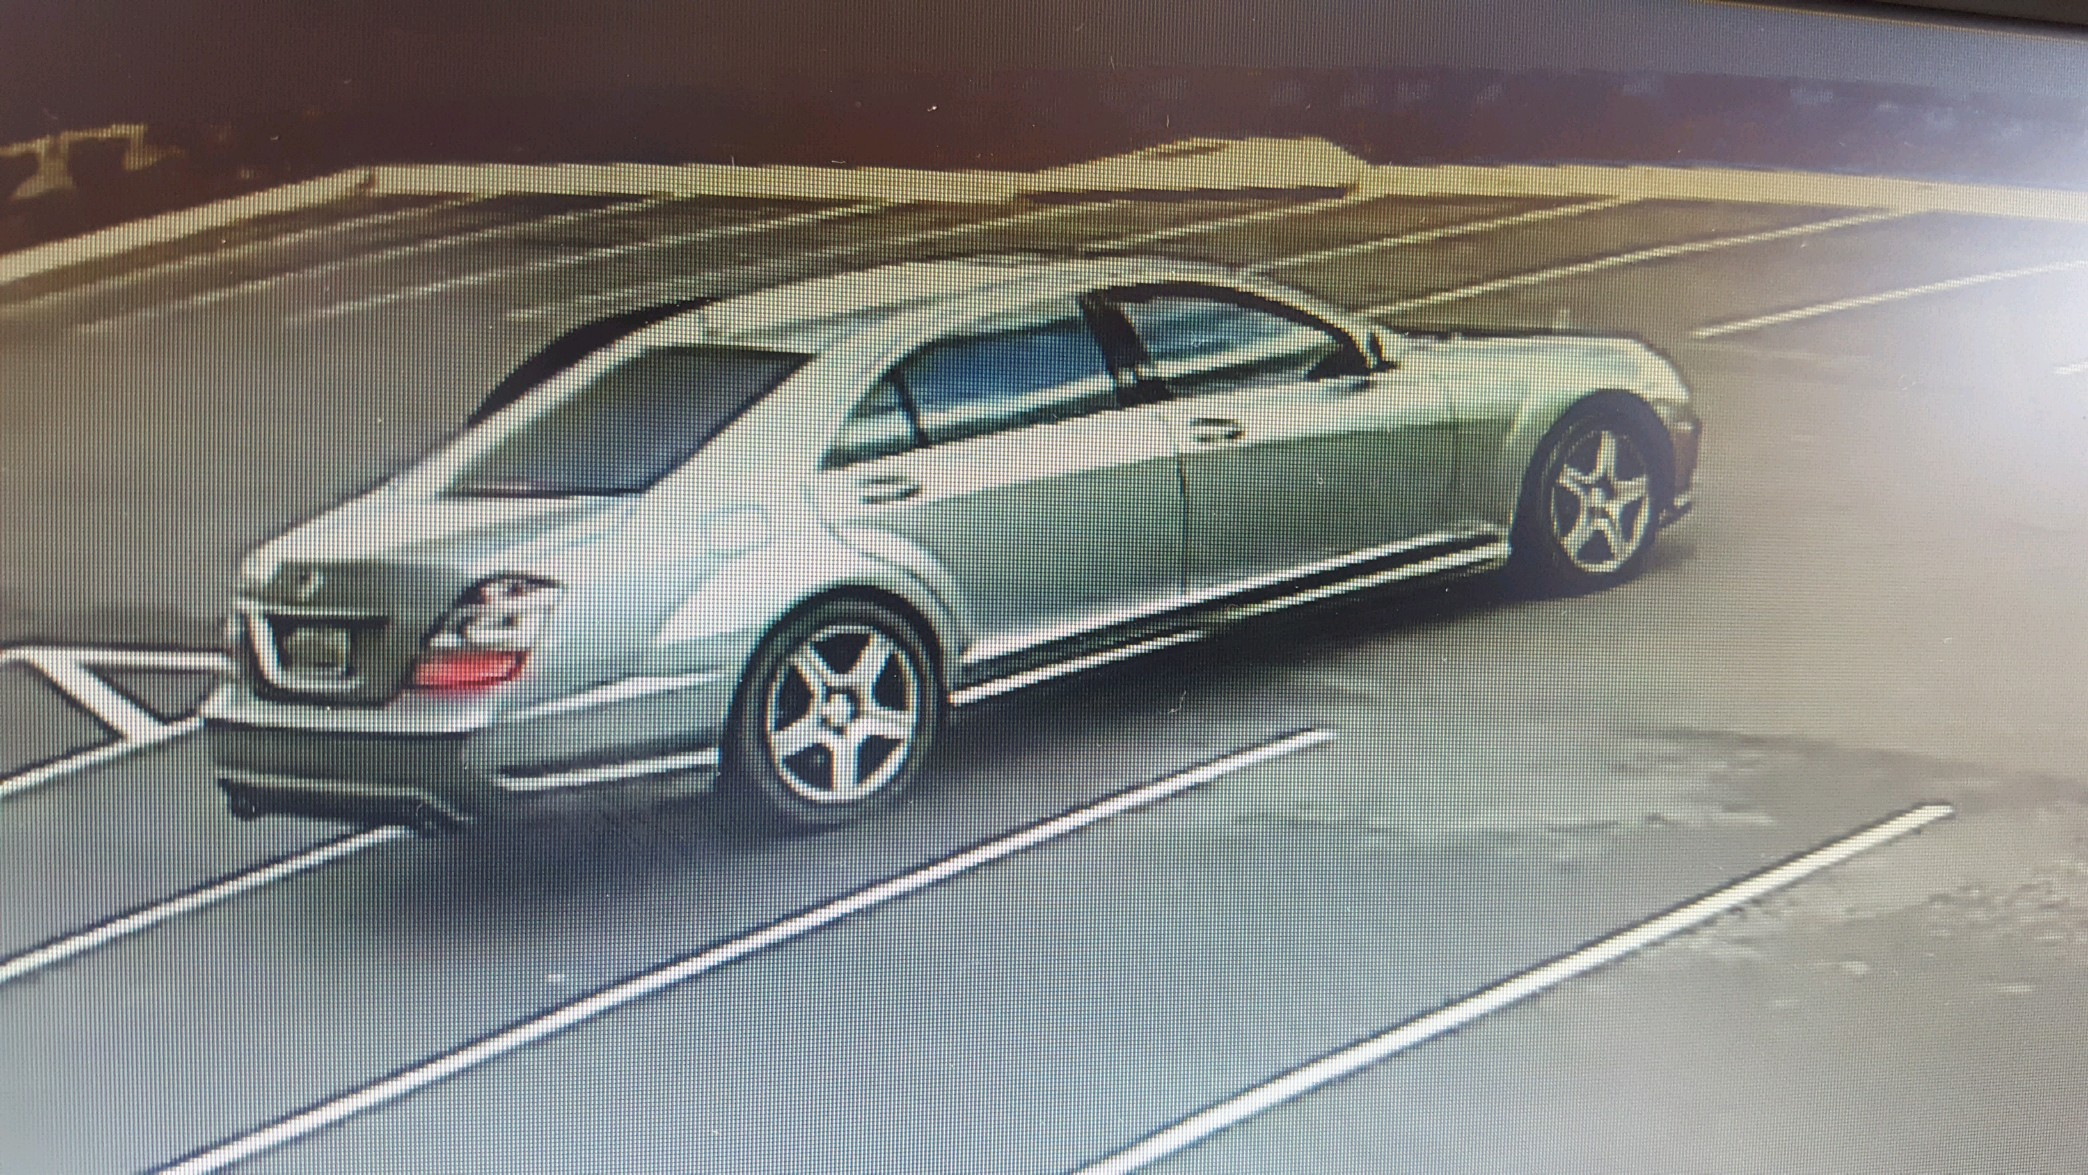 Signal 1000 Suspect Vehicle_1515711072066.jpeg.jpg